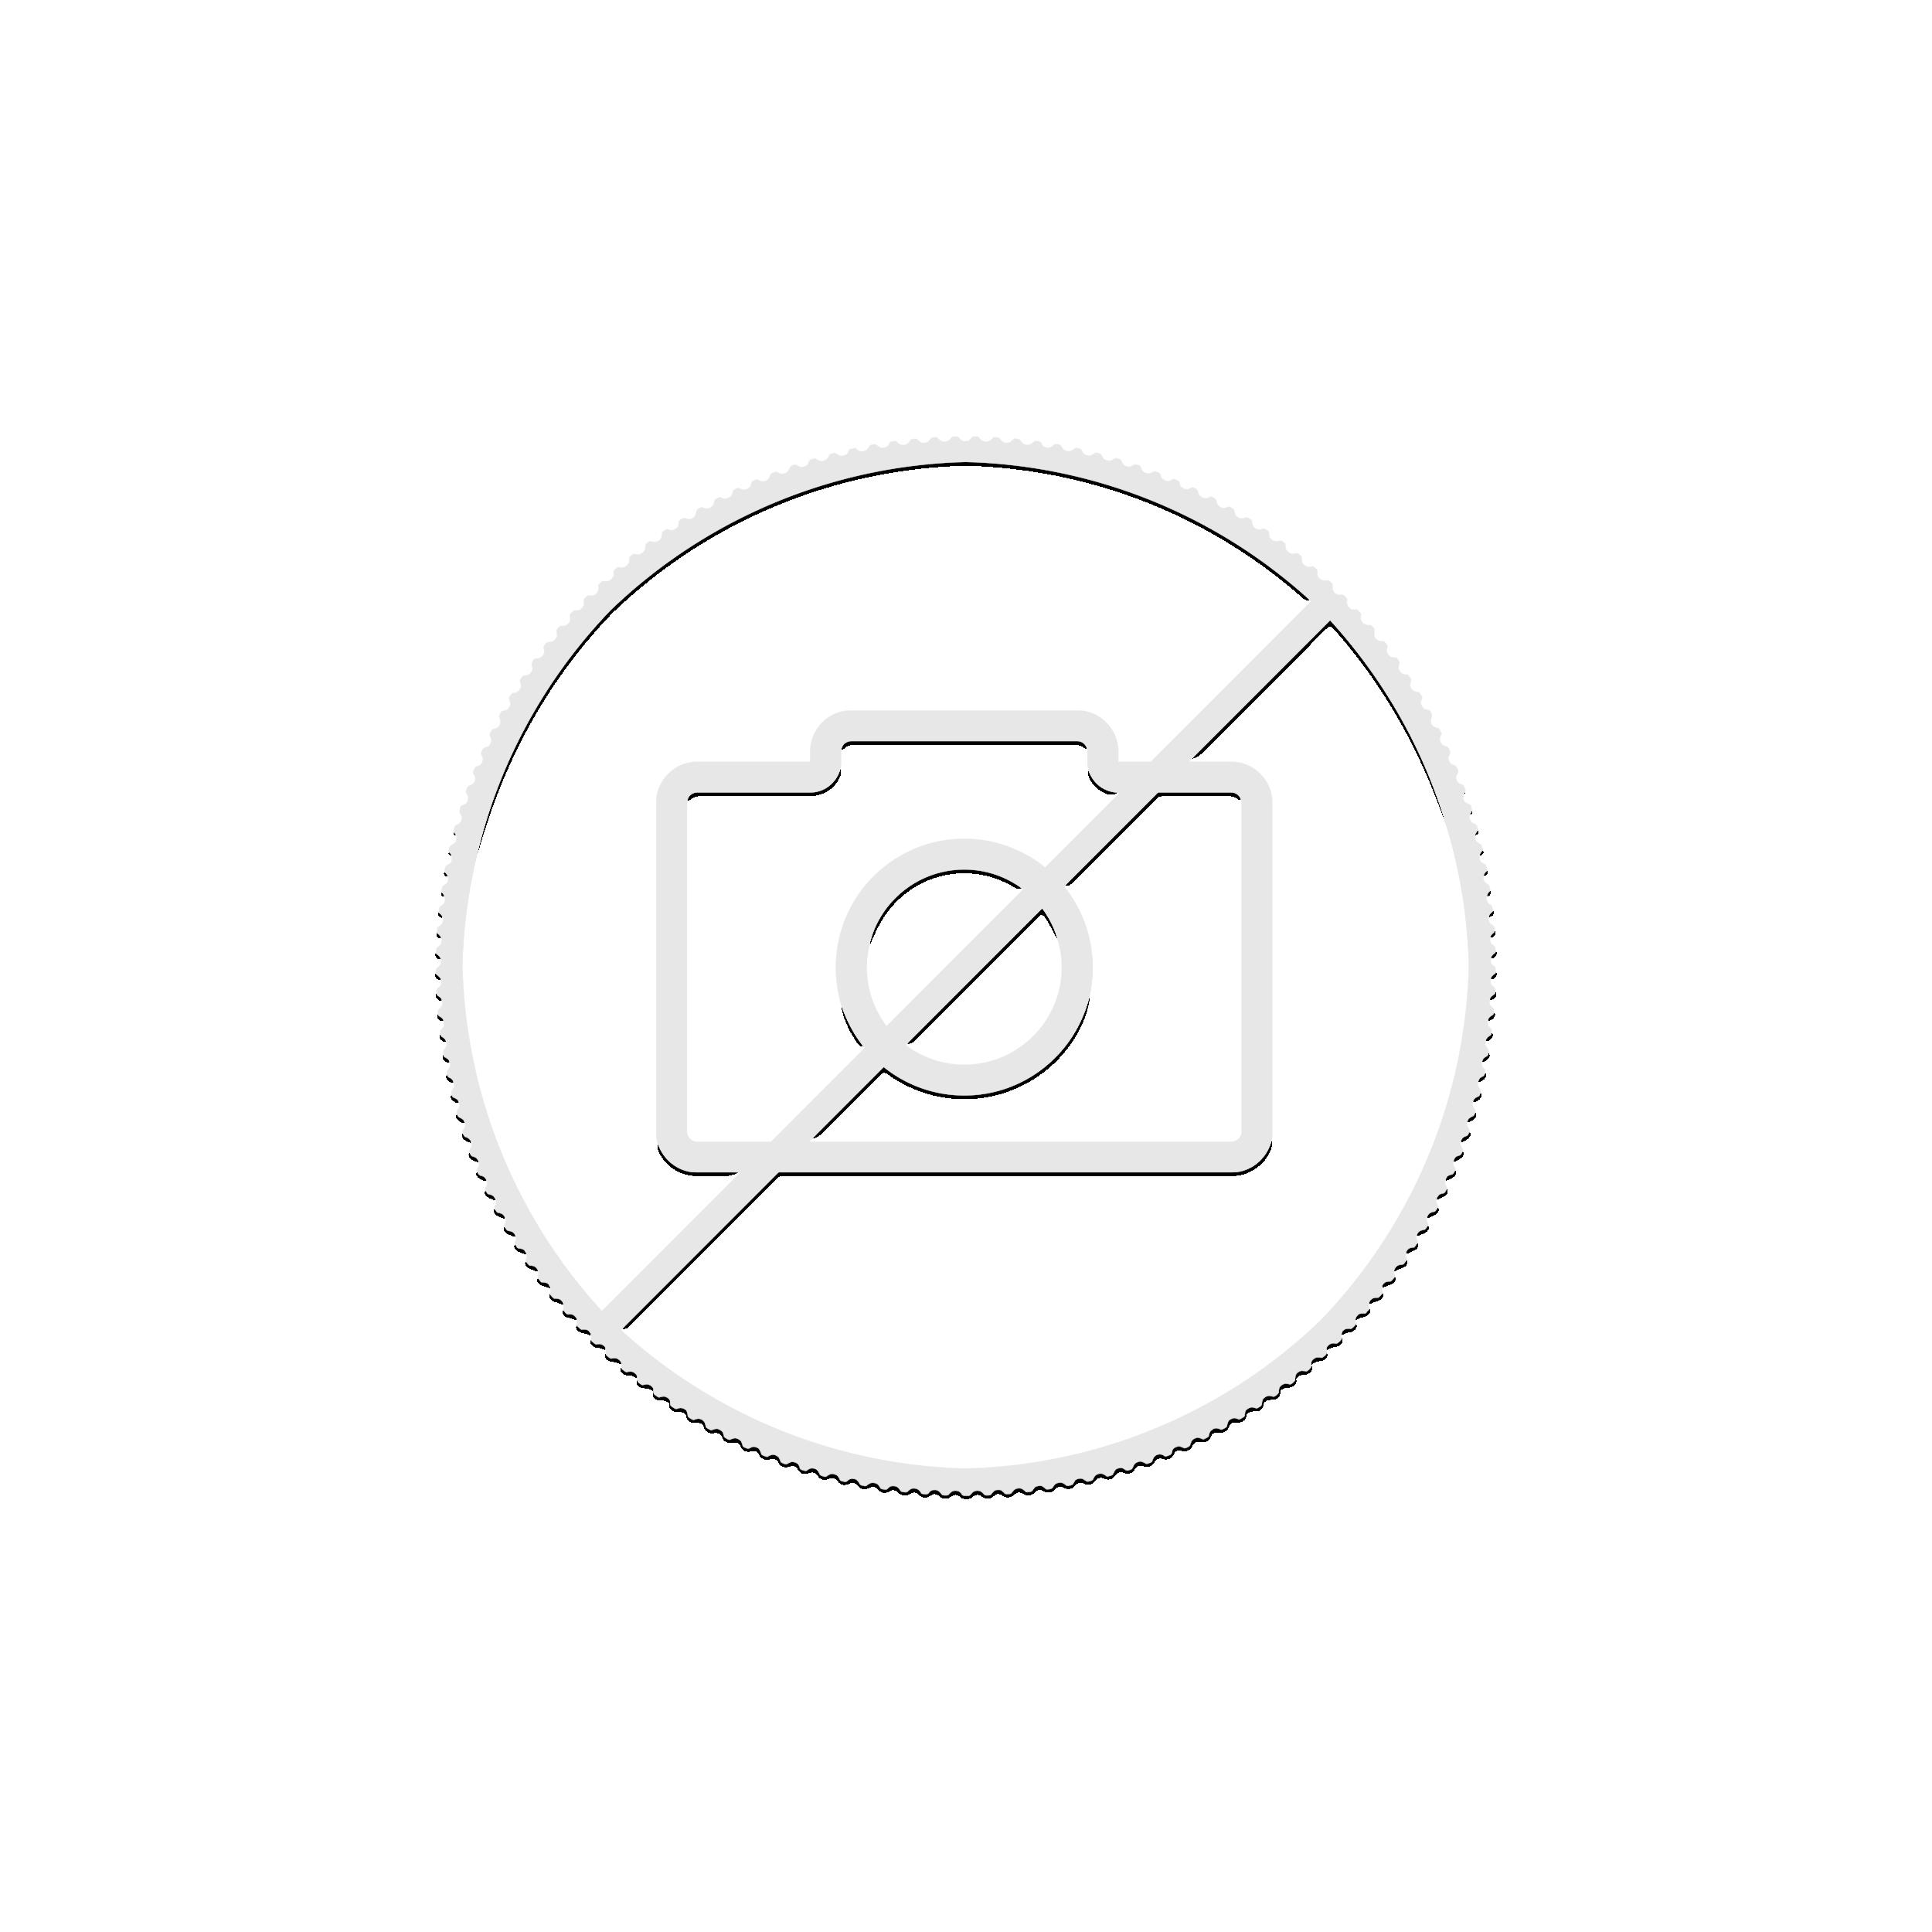 Box of 10x round coin capsules 41mm